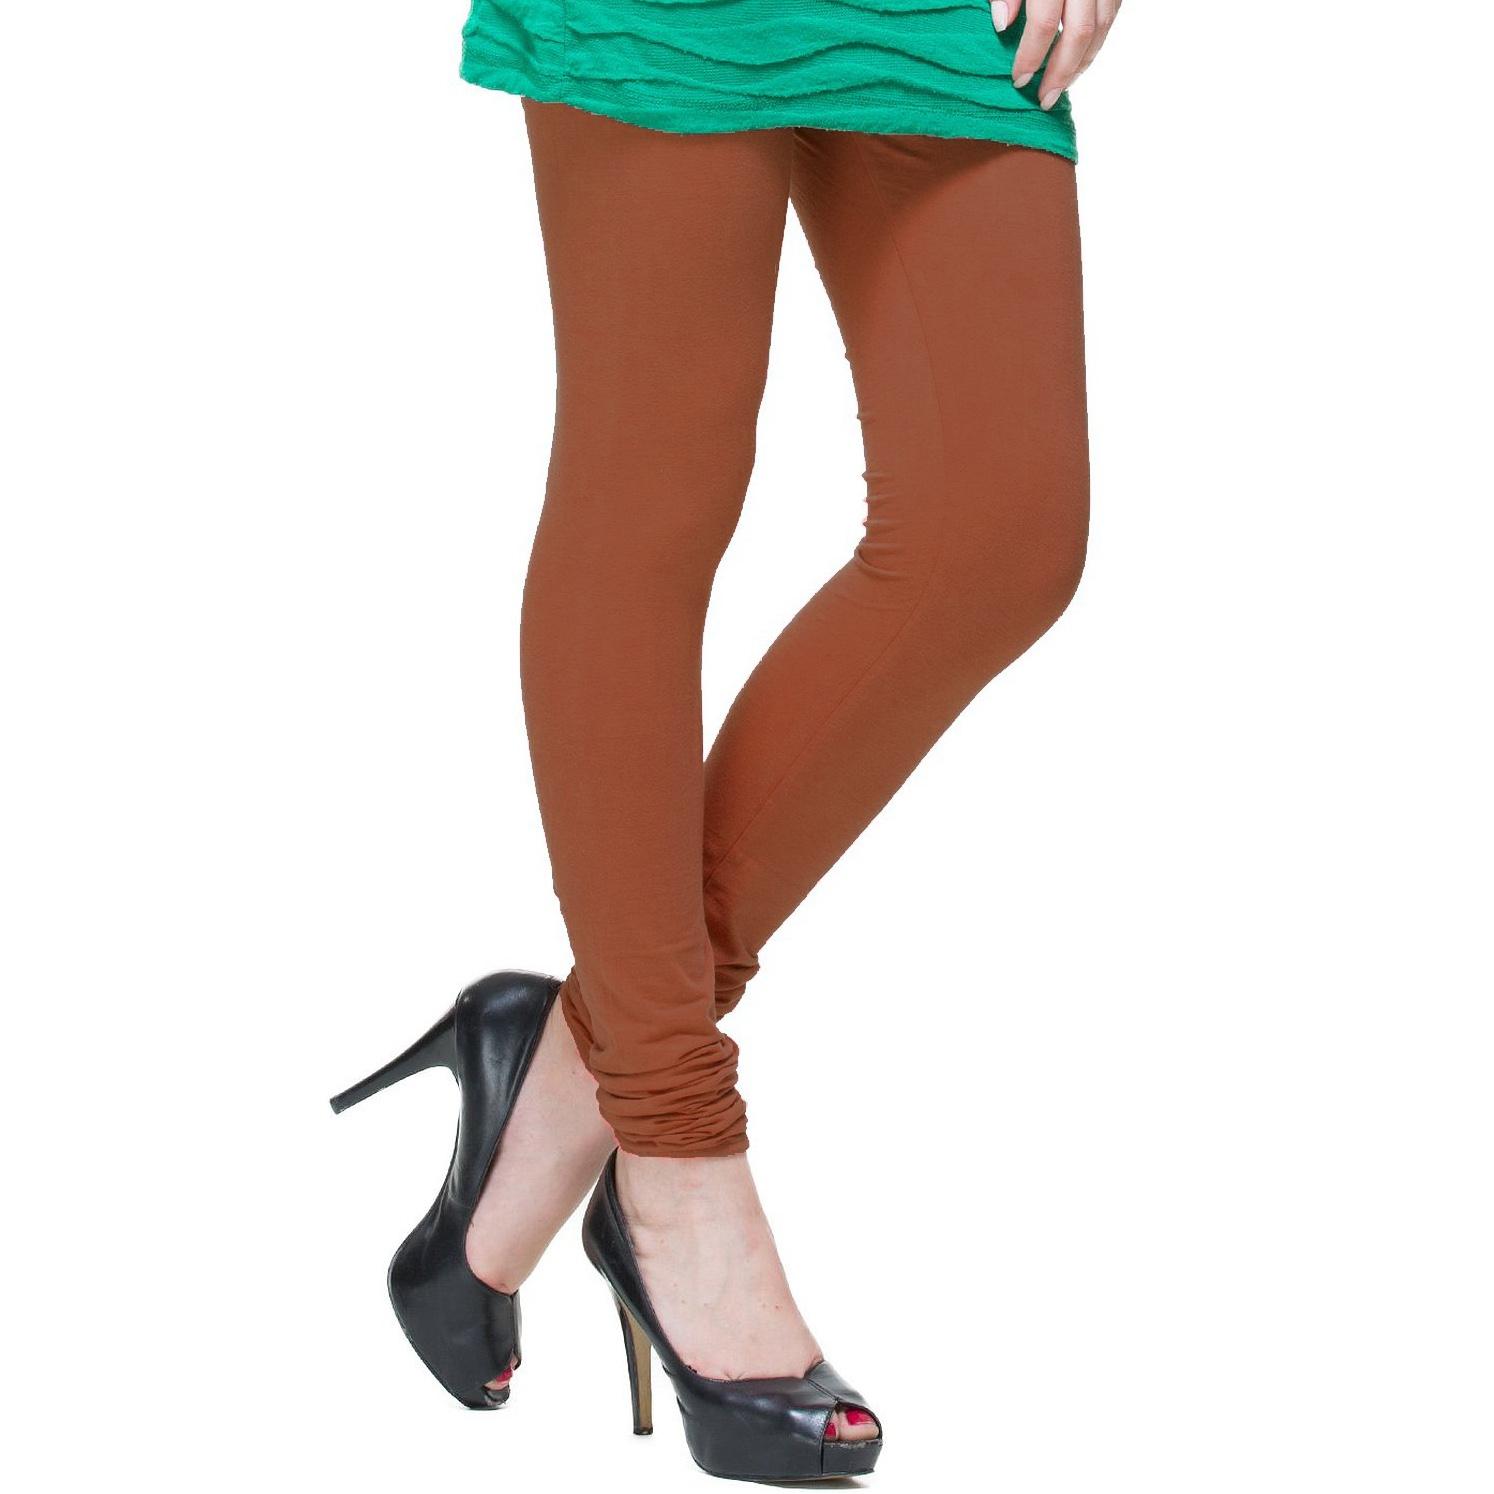 6-Pack Solid Basic Cotton Fashion Leggings - Tanga